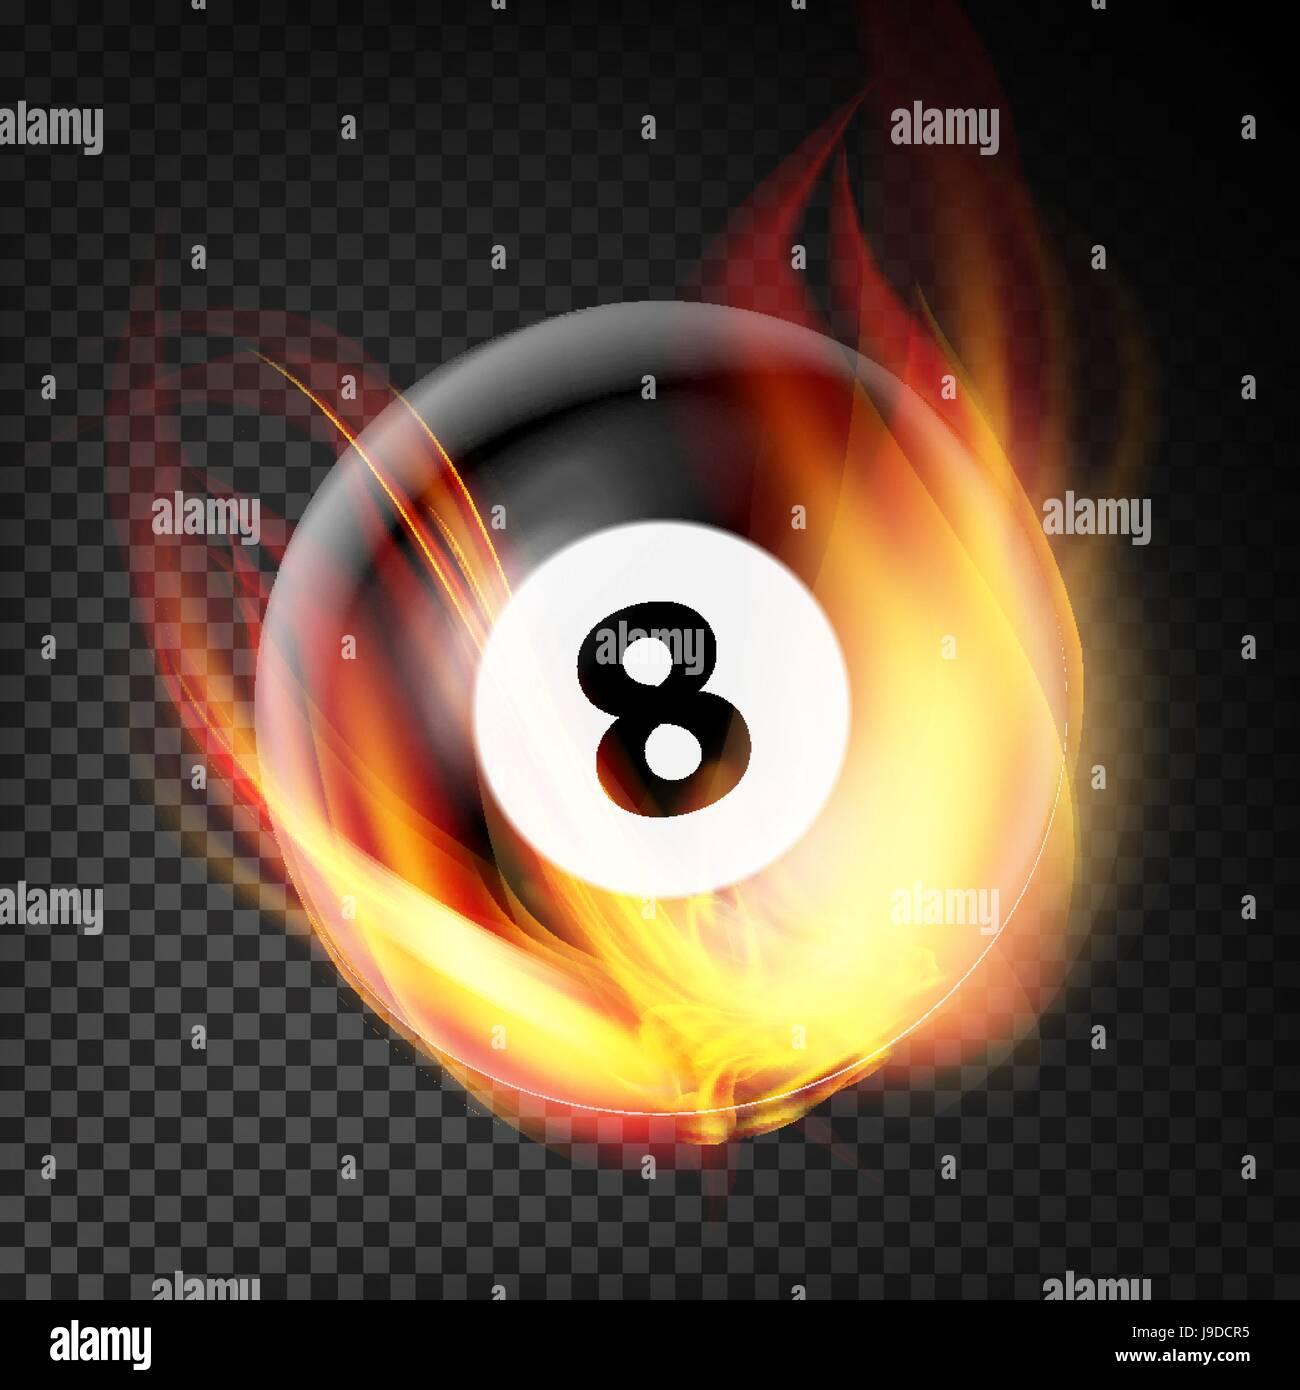 Billiard Ball In Fire Vector Realistic. Burning Billiard Ball. Transparent Background - Stock Vector